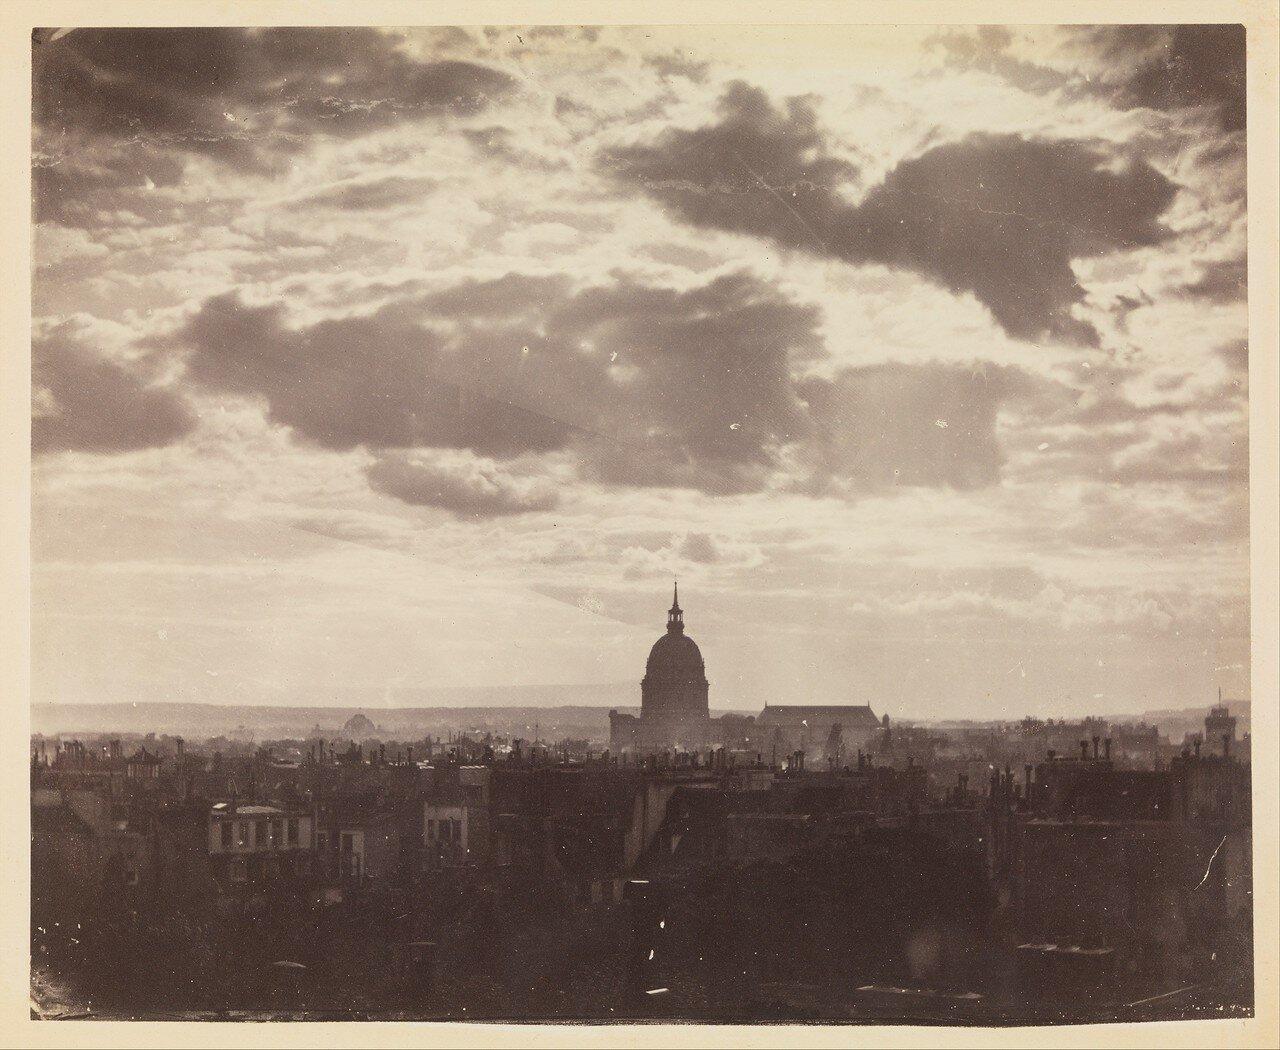 1850-е. Облака над Парижем